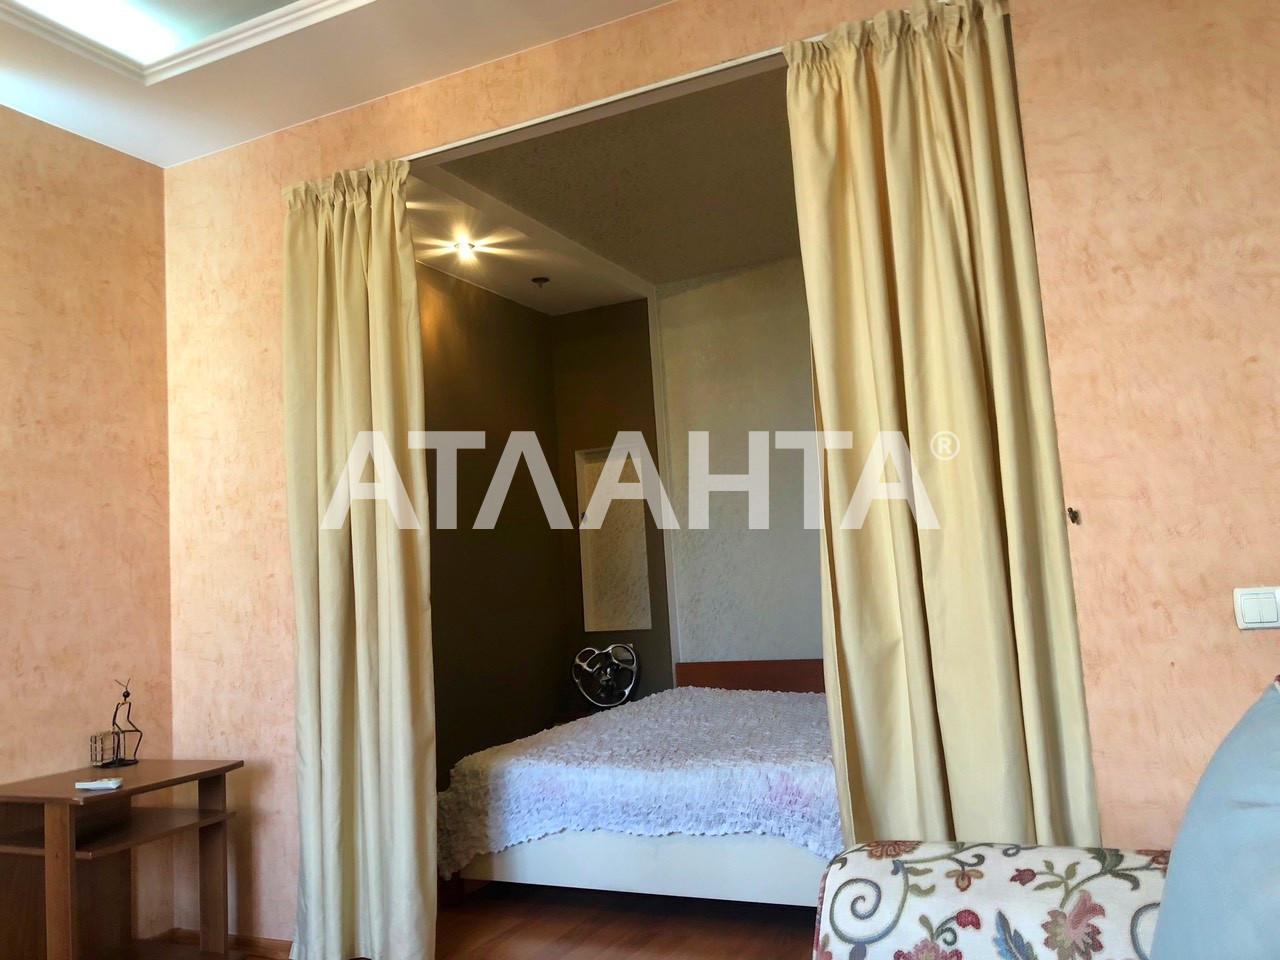 Продается 1-комнатная Квартира на ул. Вишневского Ген. Пер. — 40 999 у.е. (фото №8)